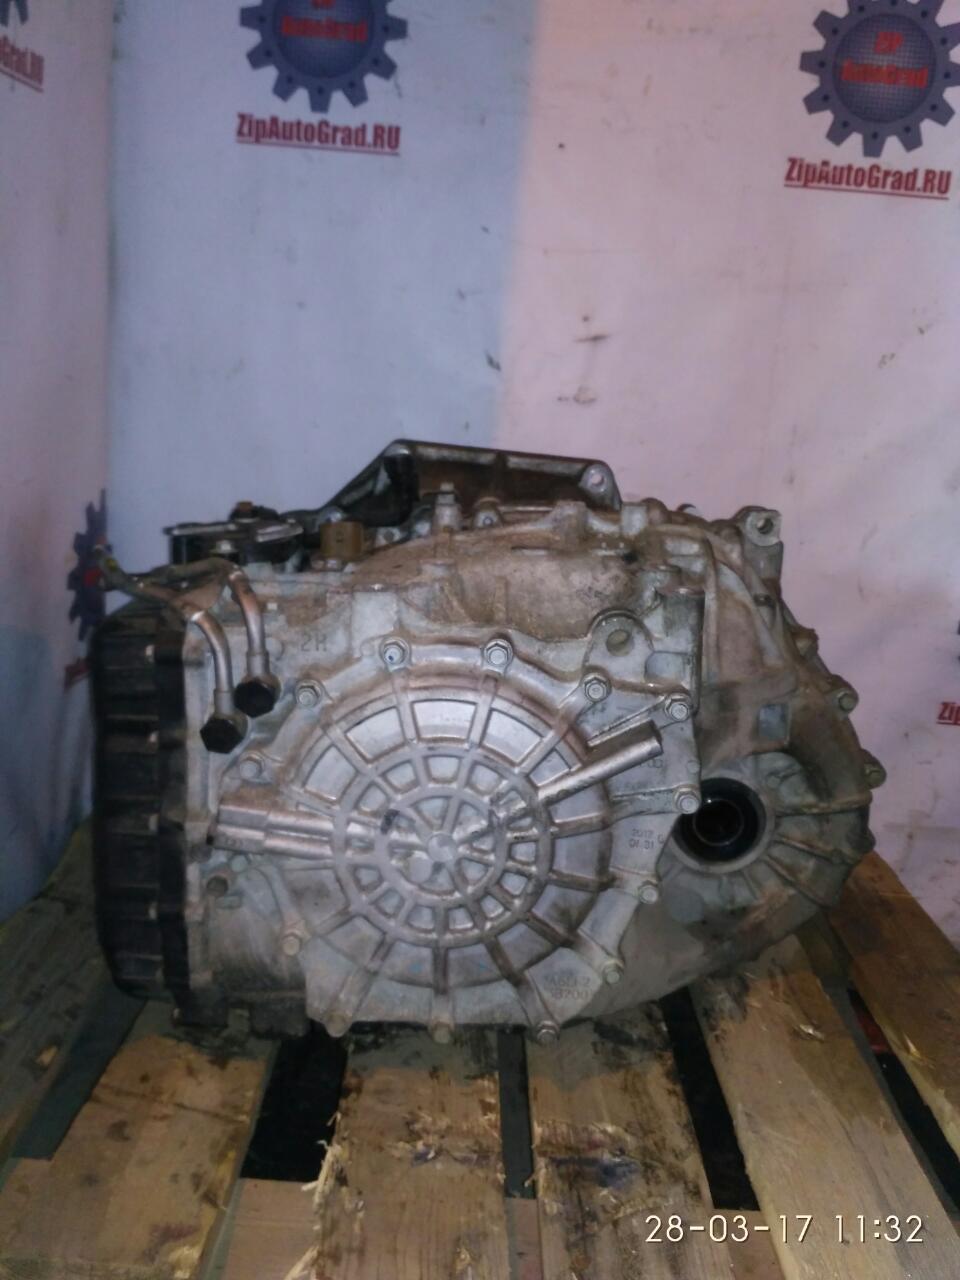 АКПП A6LF2 Kia Sportage. Кузов: 3. D4HA. , 2.0л., 136л.с.  фото 4